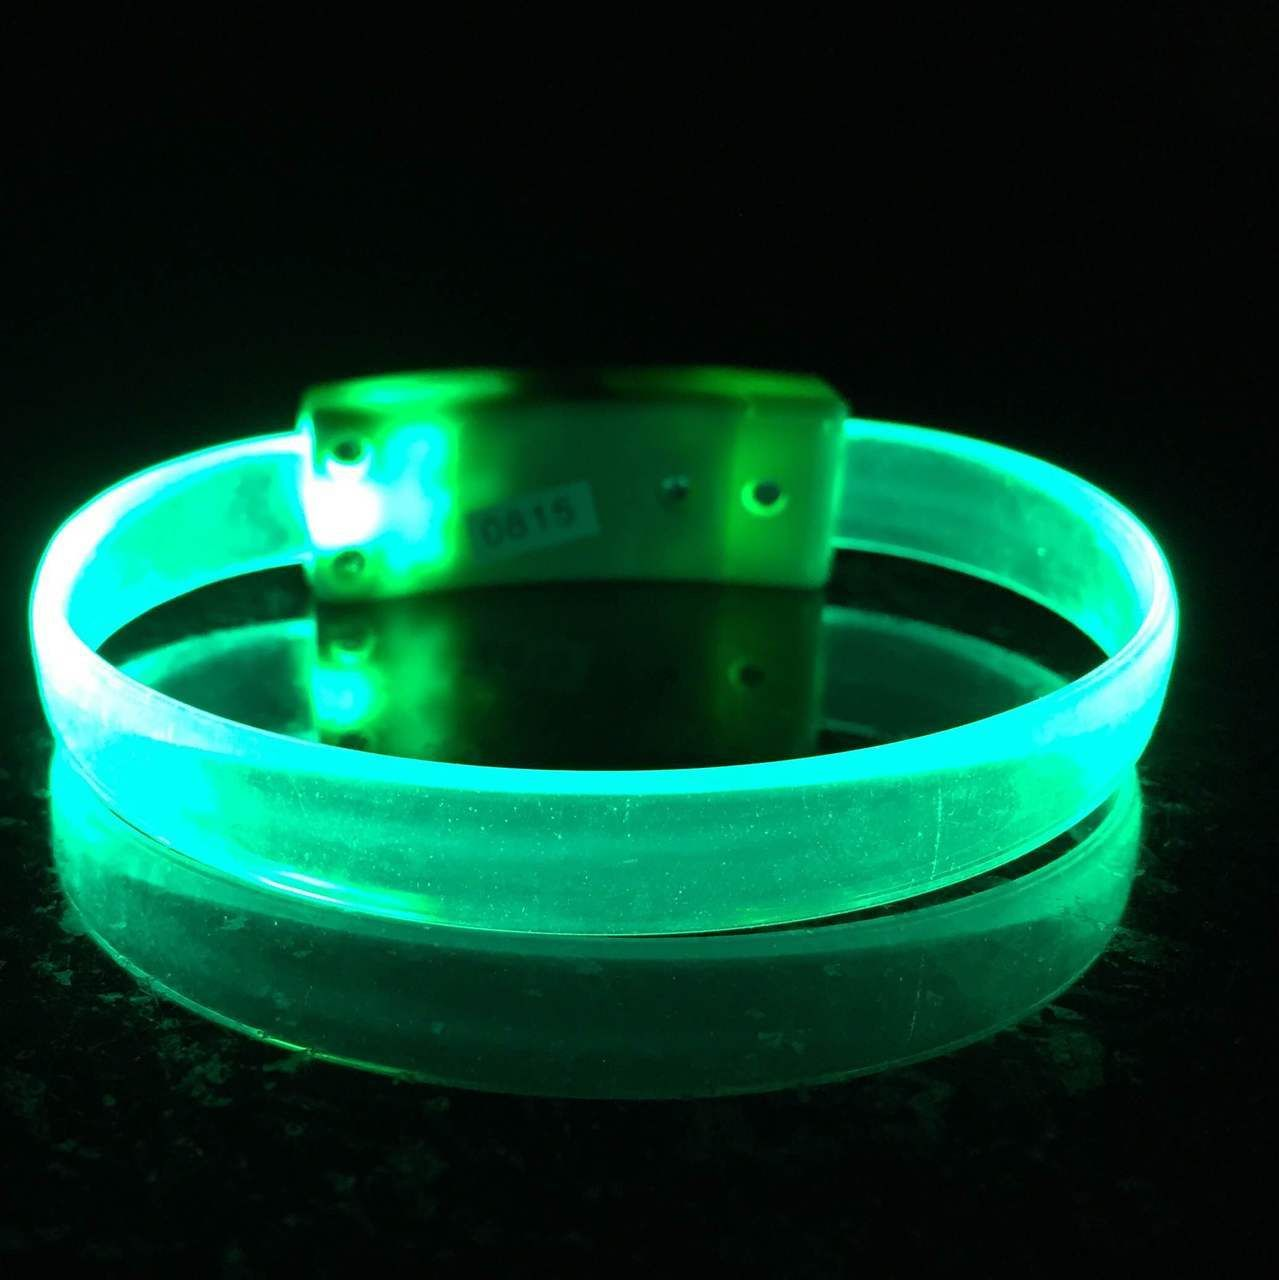 906df500ecf NightclubShop.com - LED WRISTBANDS - Light Up Optical LED Bands - Blank -  Not